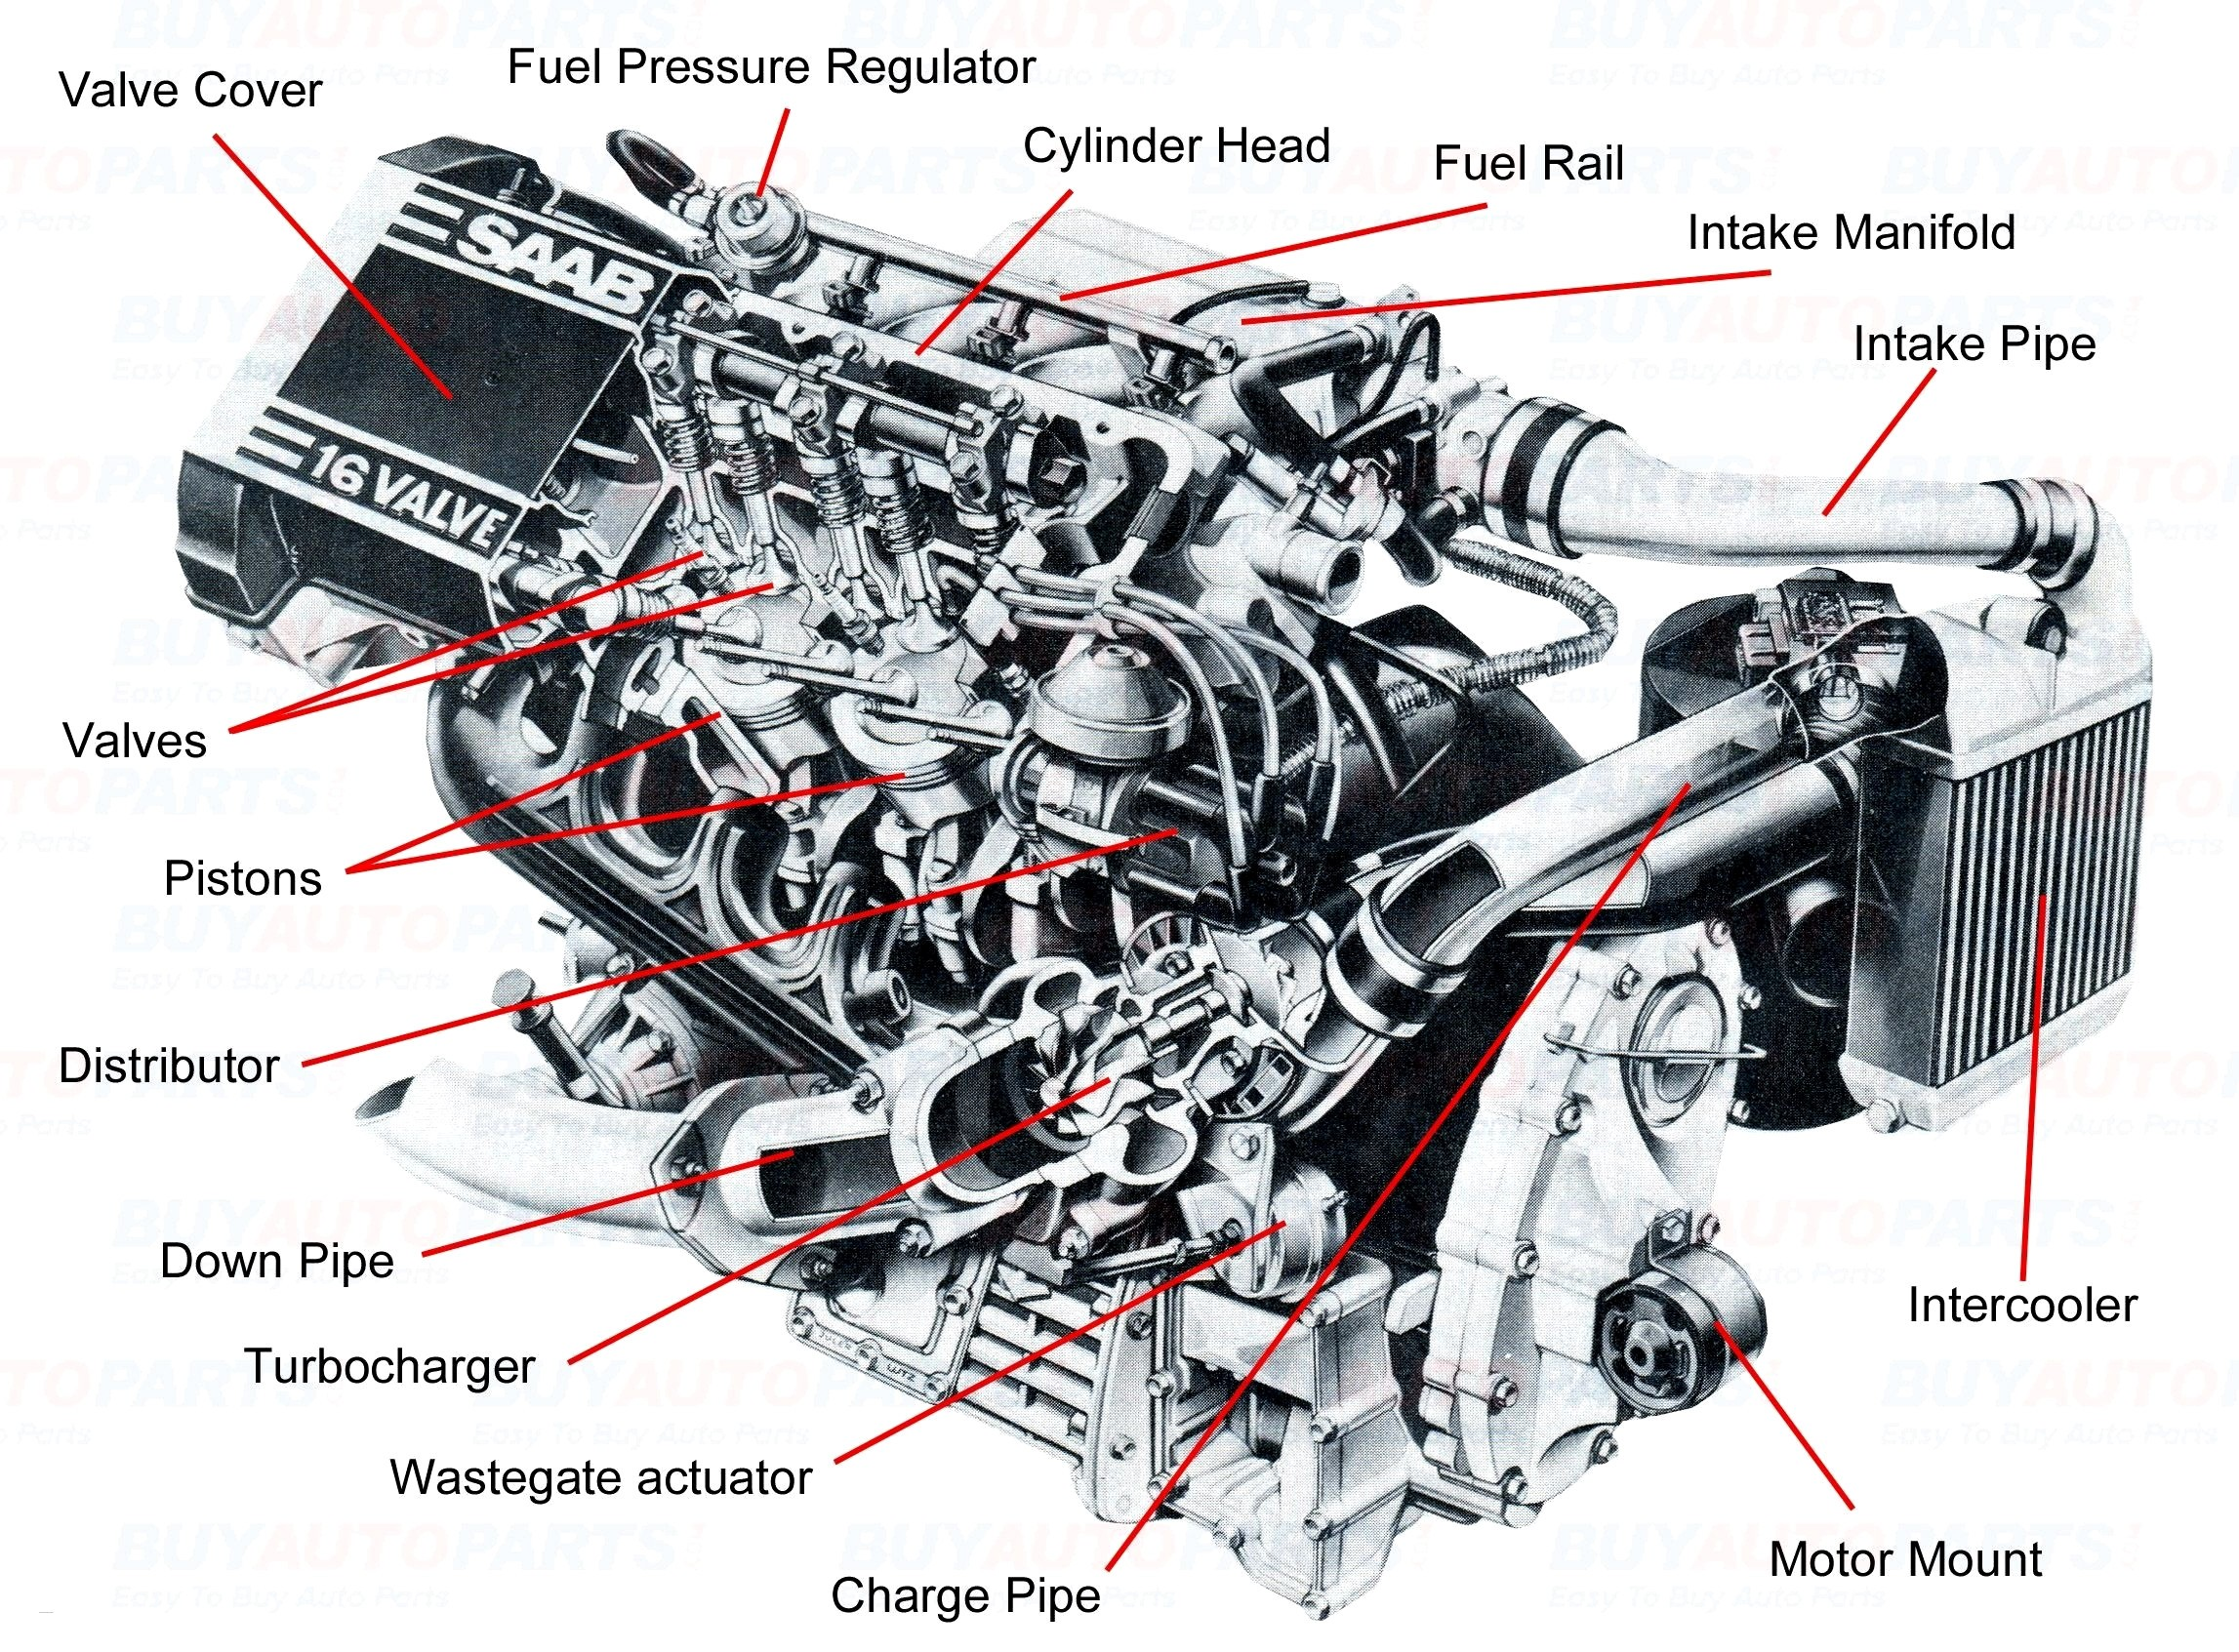 Bus Air Brake System Diagram Car Brake System Diagram Of Bus Air Brake System Diagram